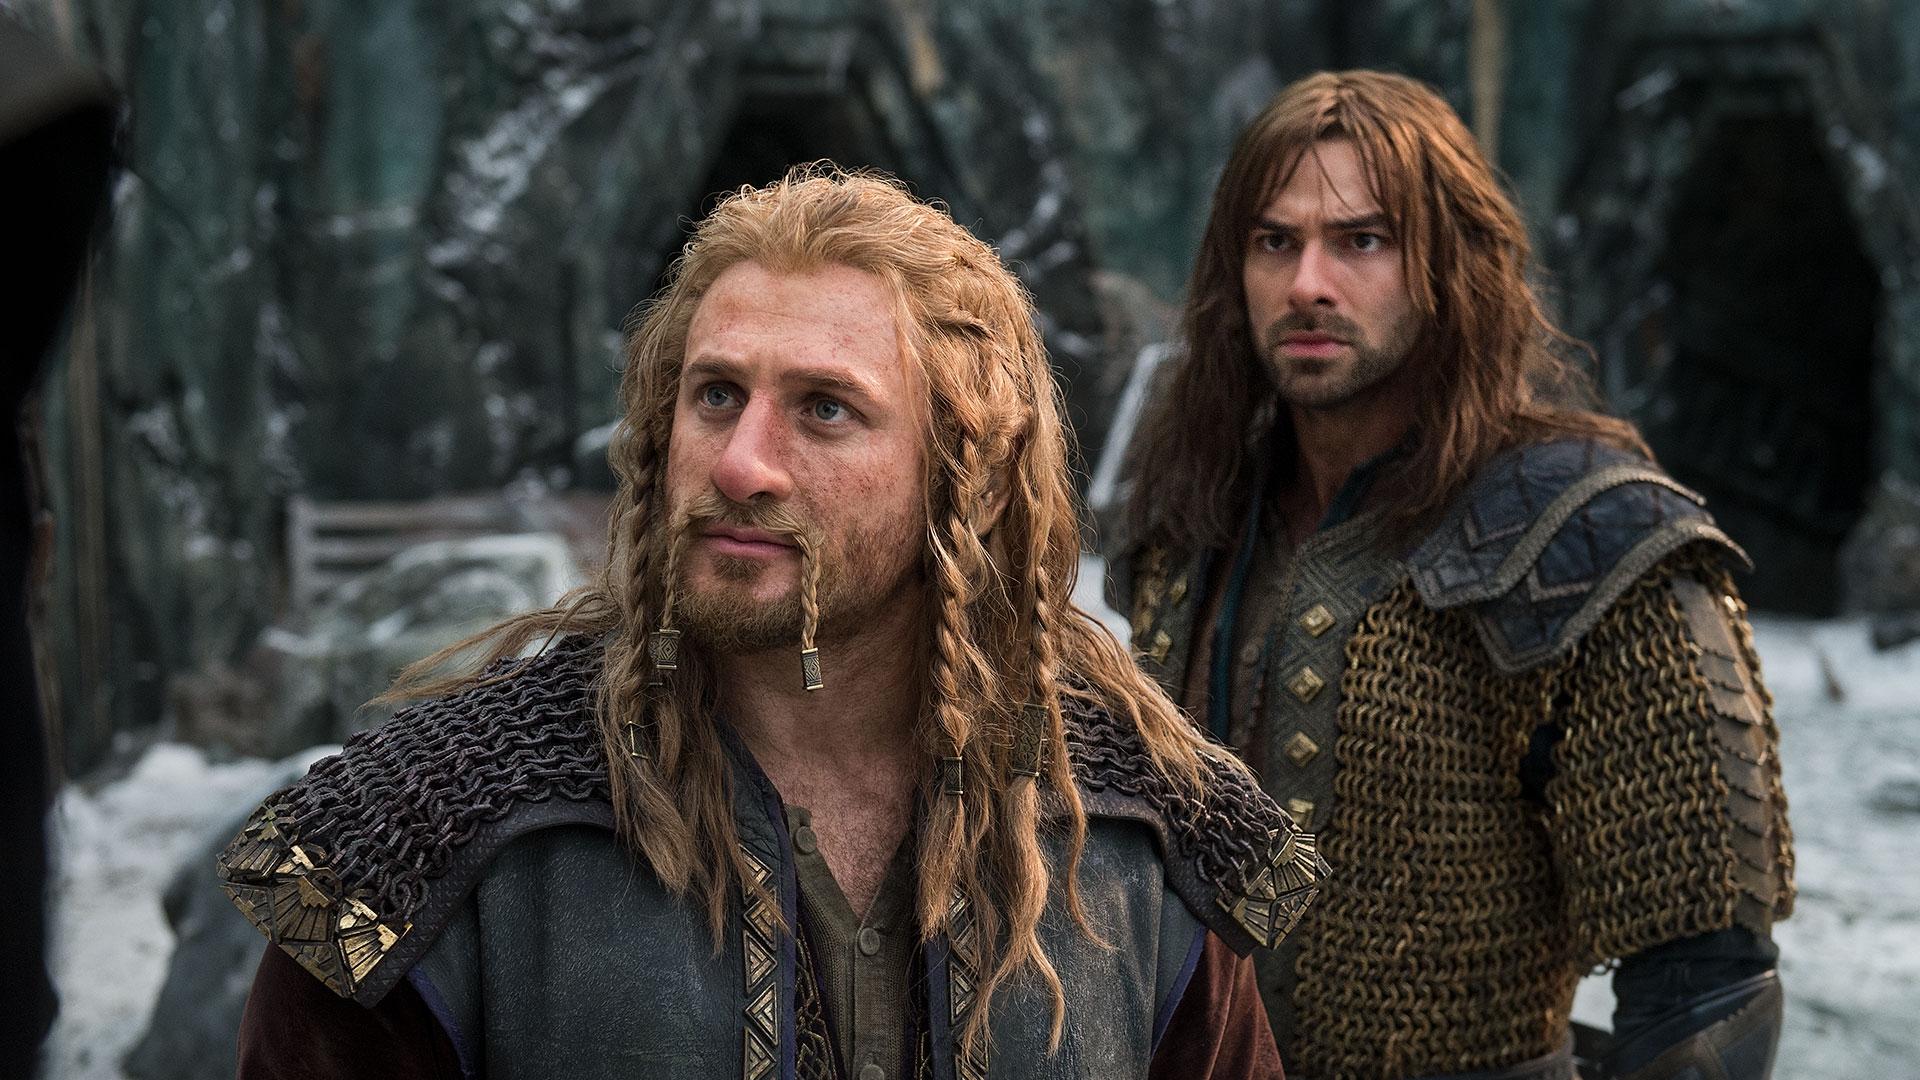 the hobbit the battle of the five armies hd putlocker